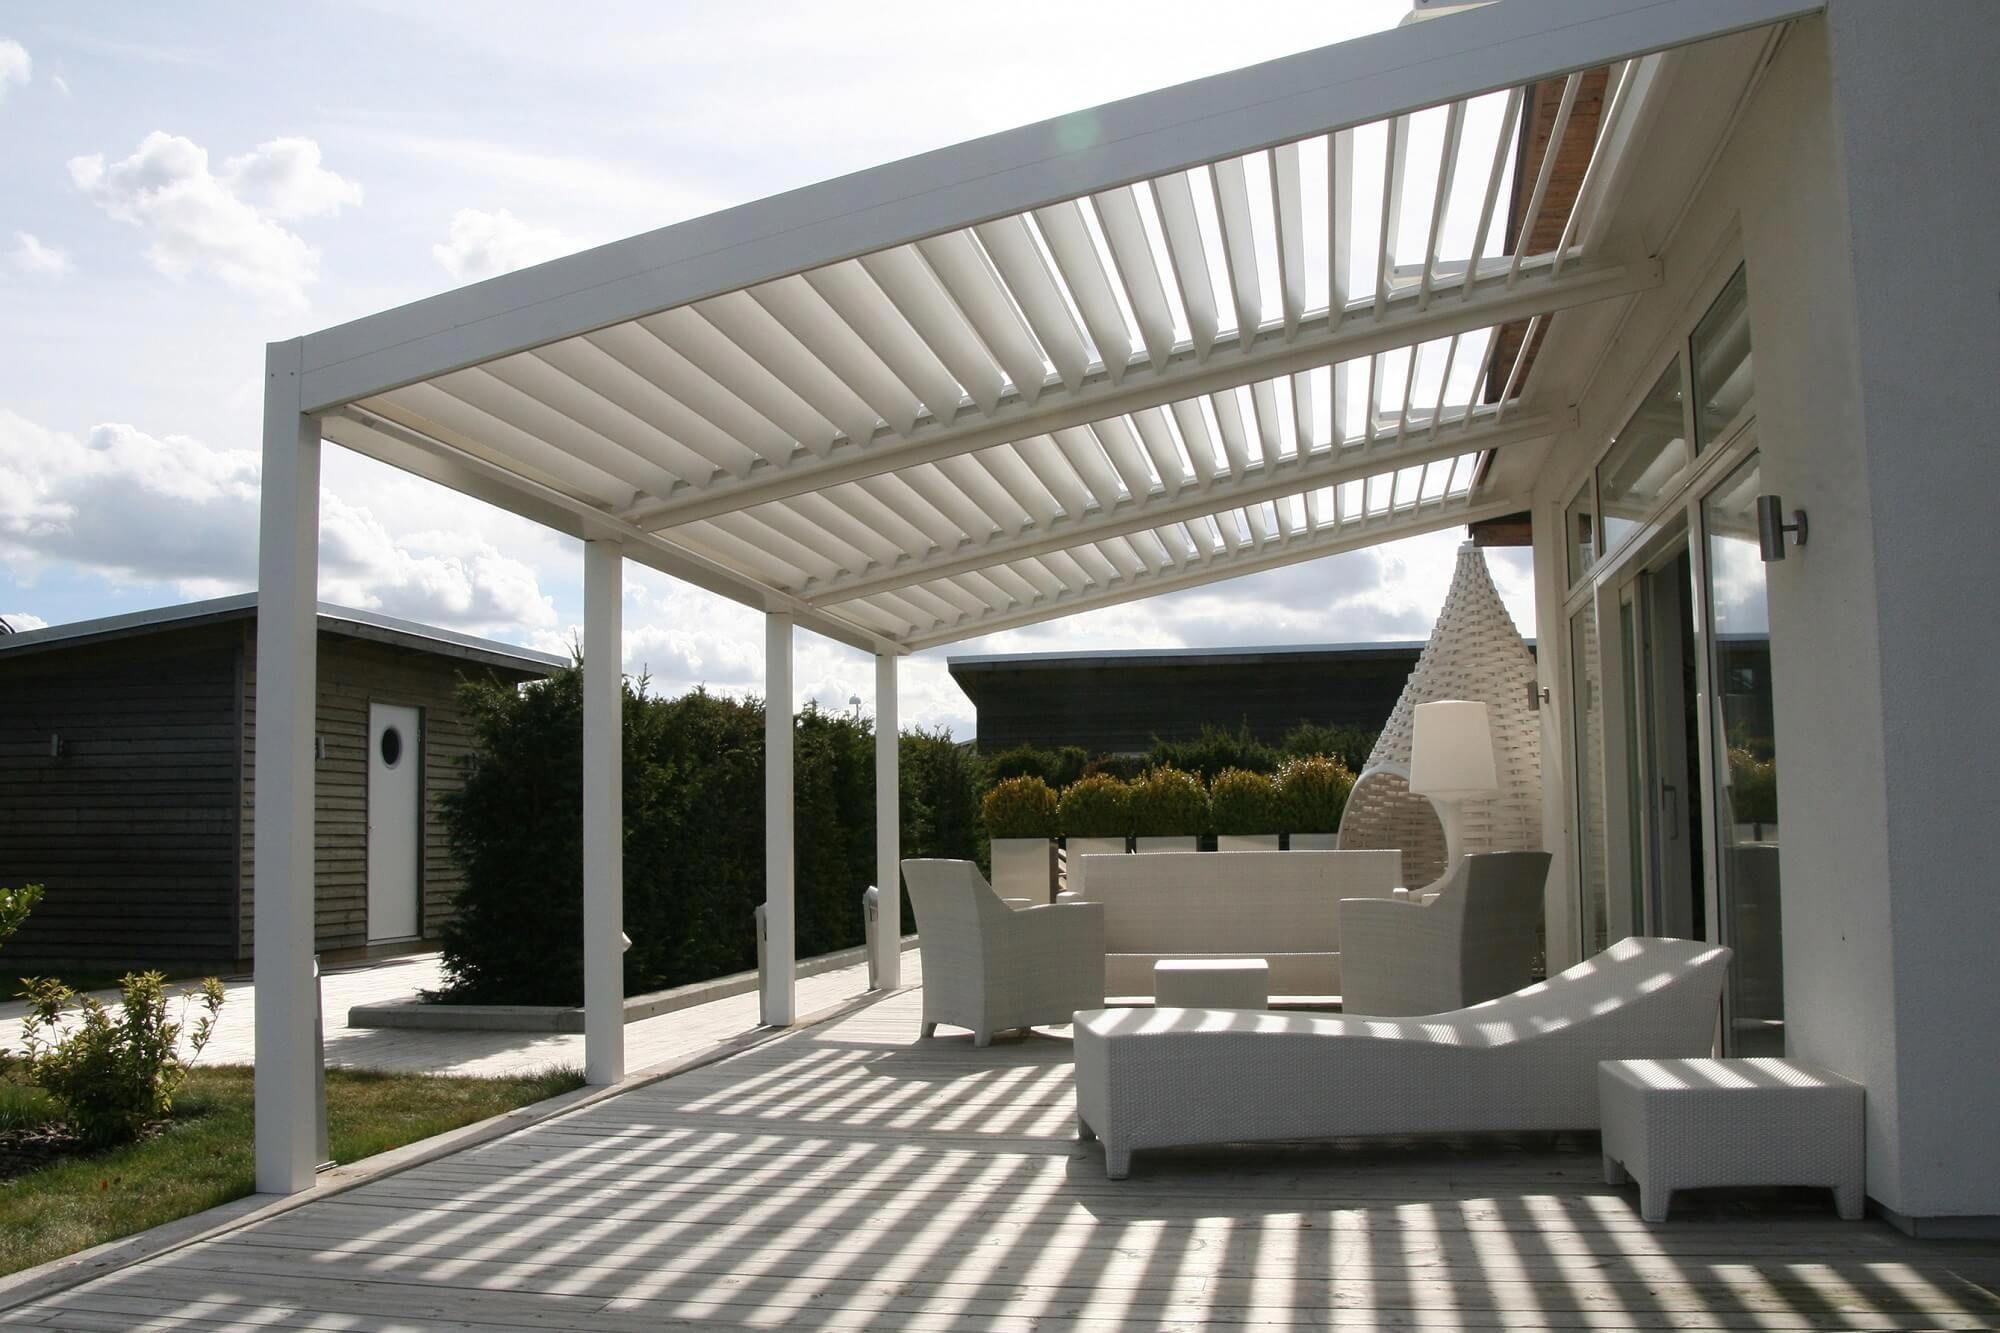 Pergola Bioclimatique Retractable Avis bioclimatique model residential rotating louver roof system